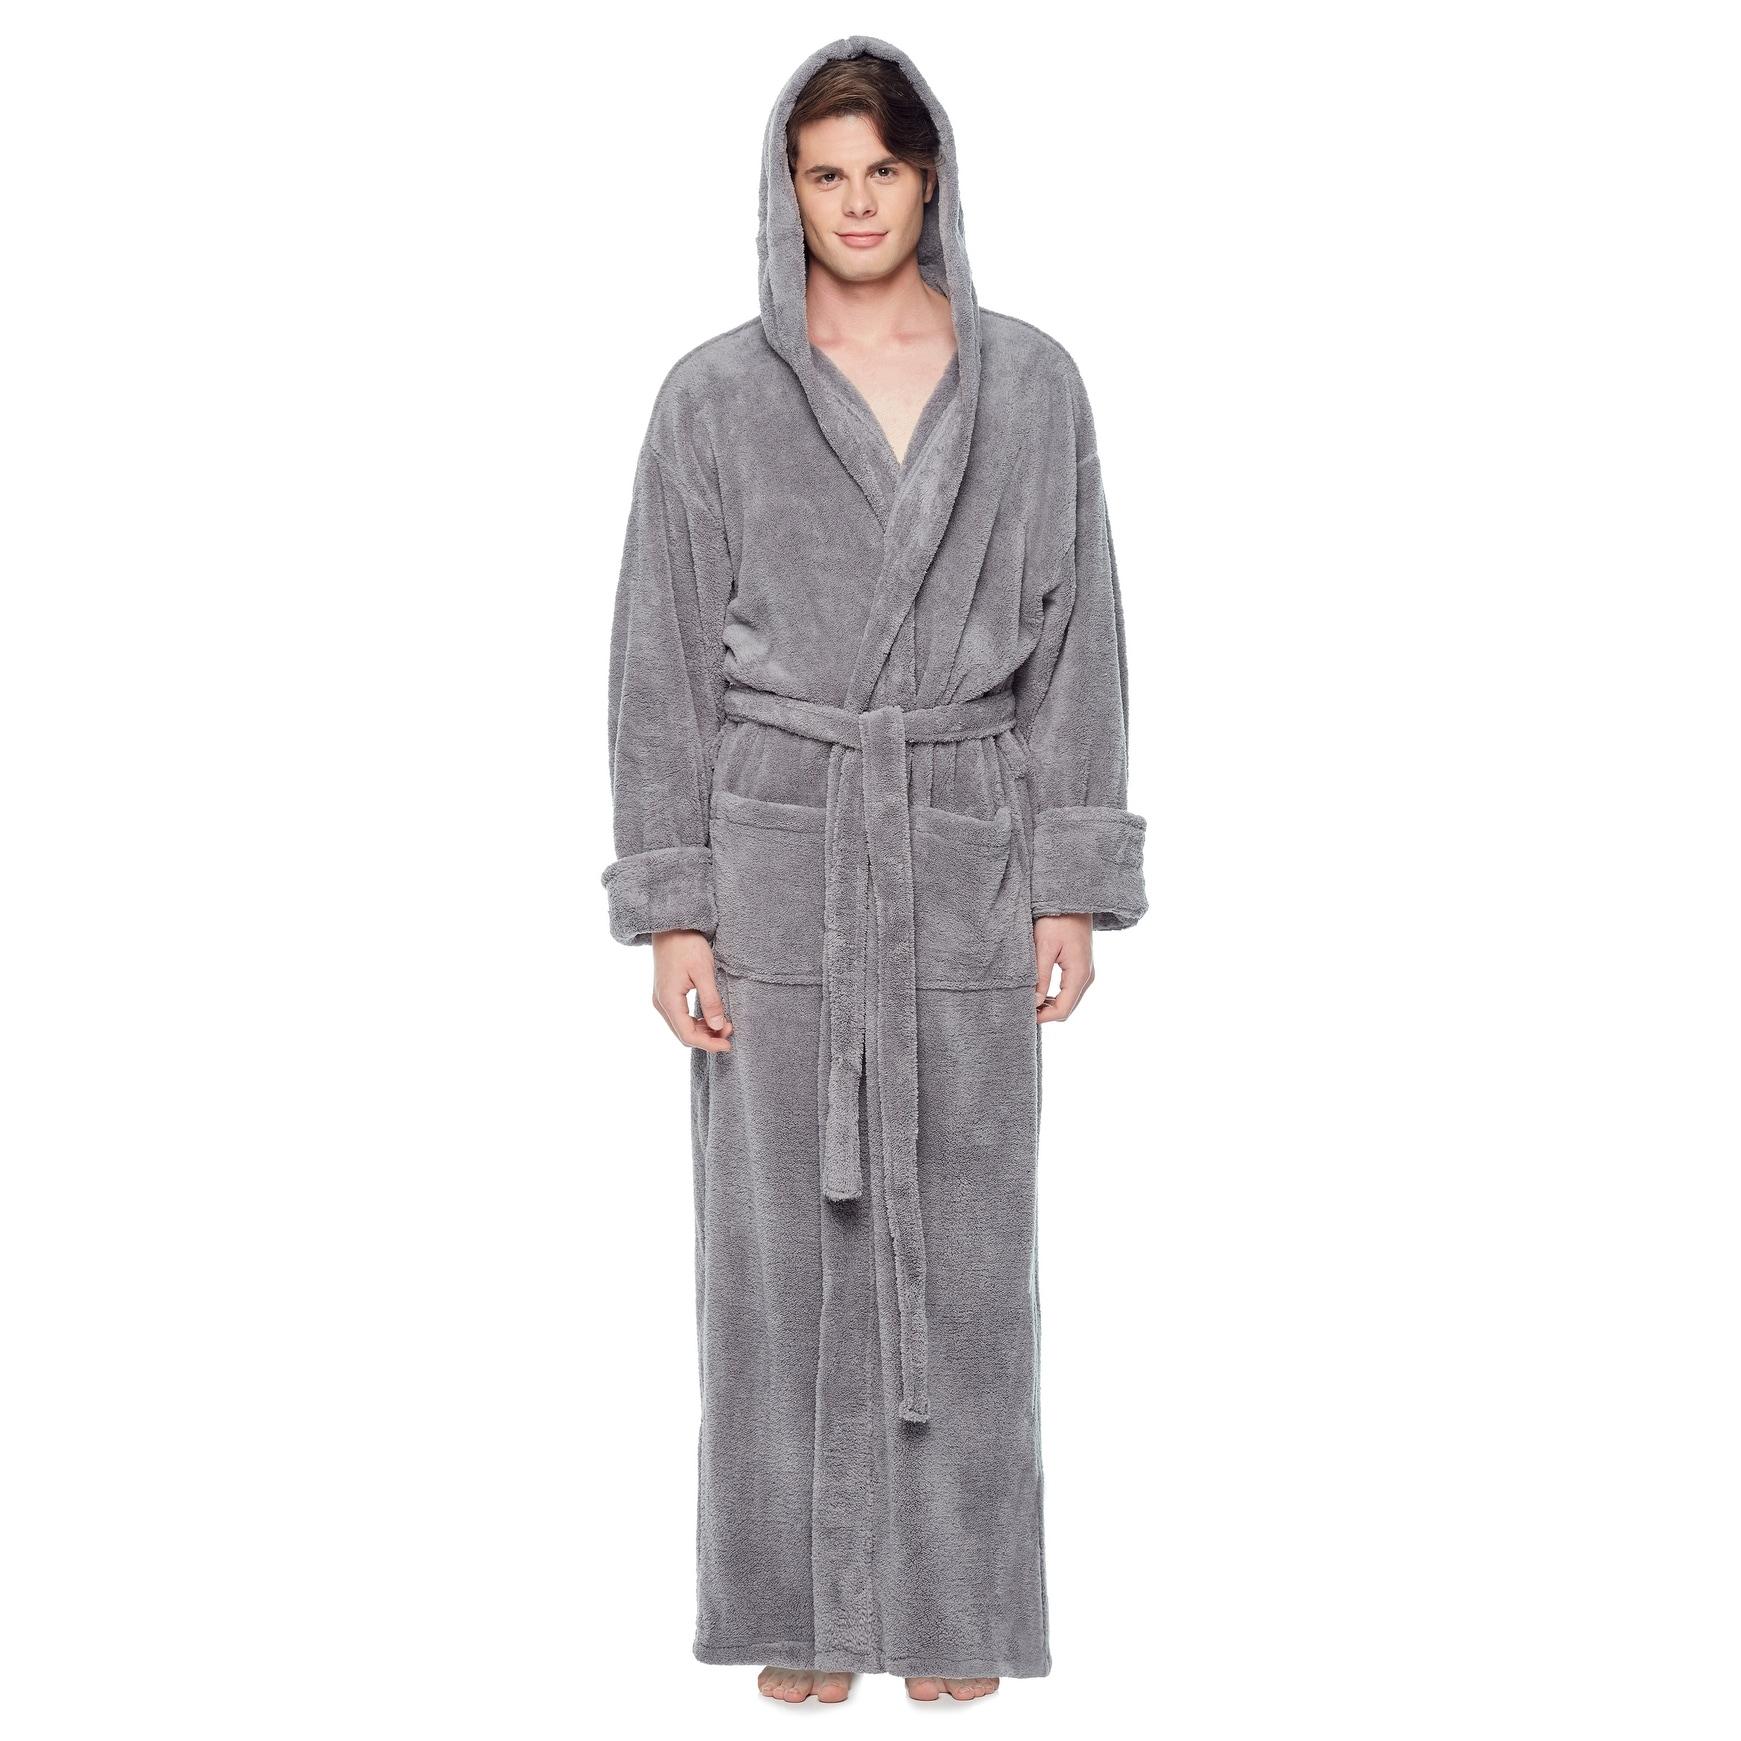 Flannel Full Length Bathrobes Plush Fleece Long Robes For Men With Zipper Sleep Lounge Robes